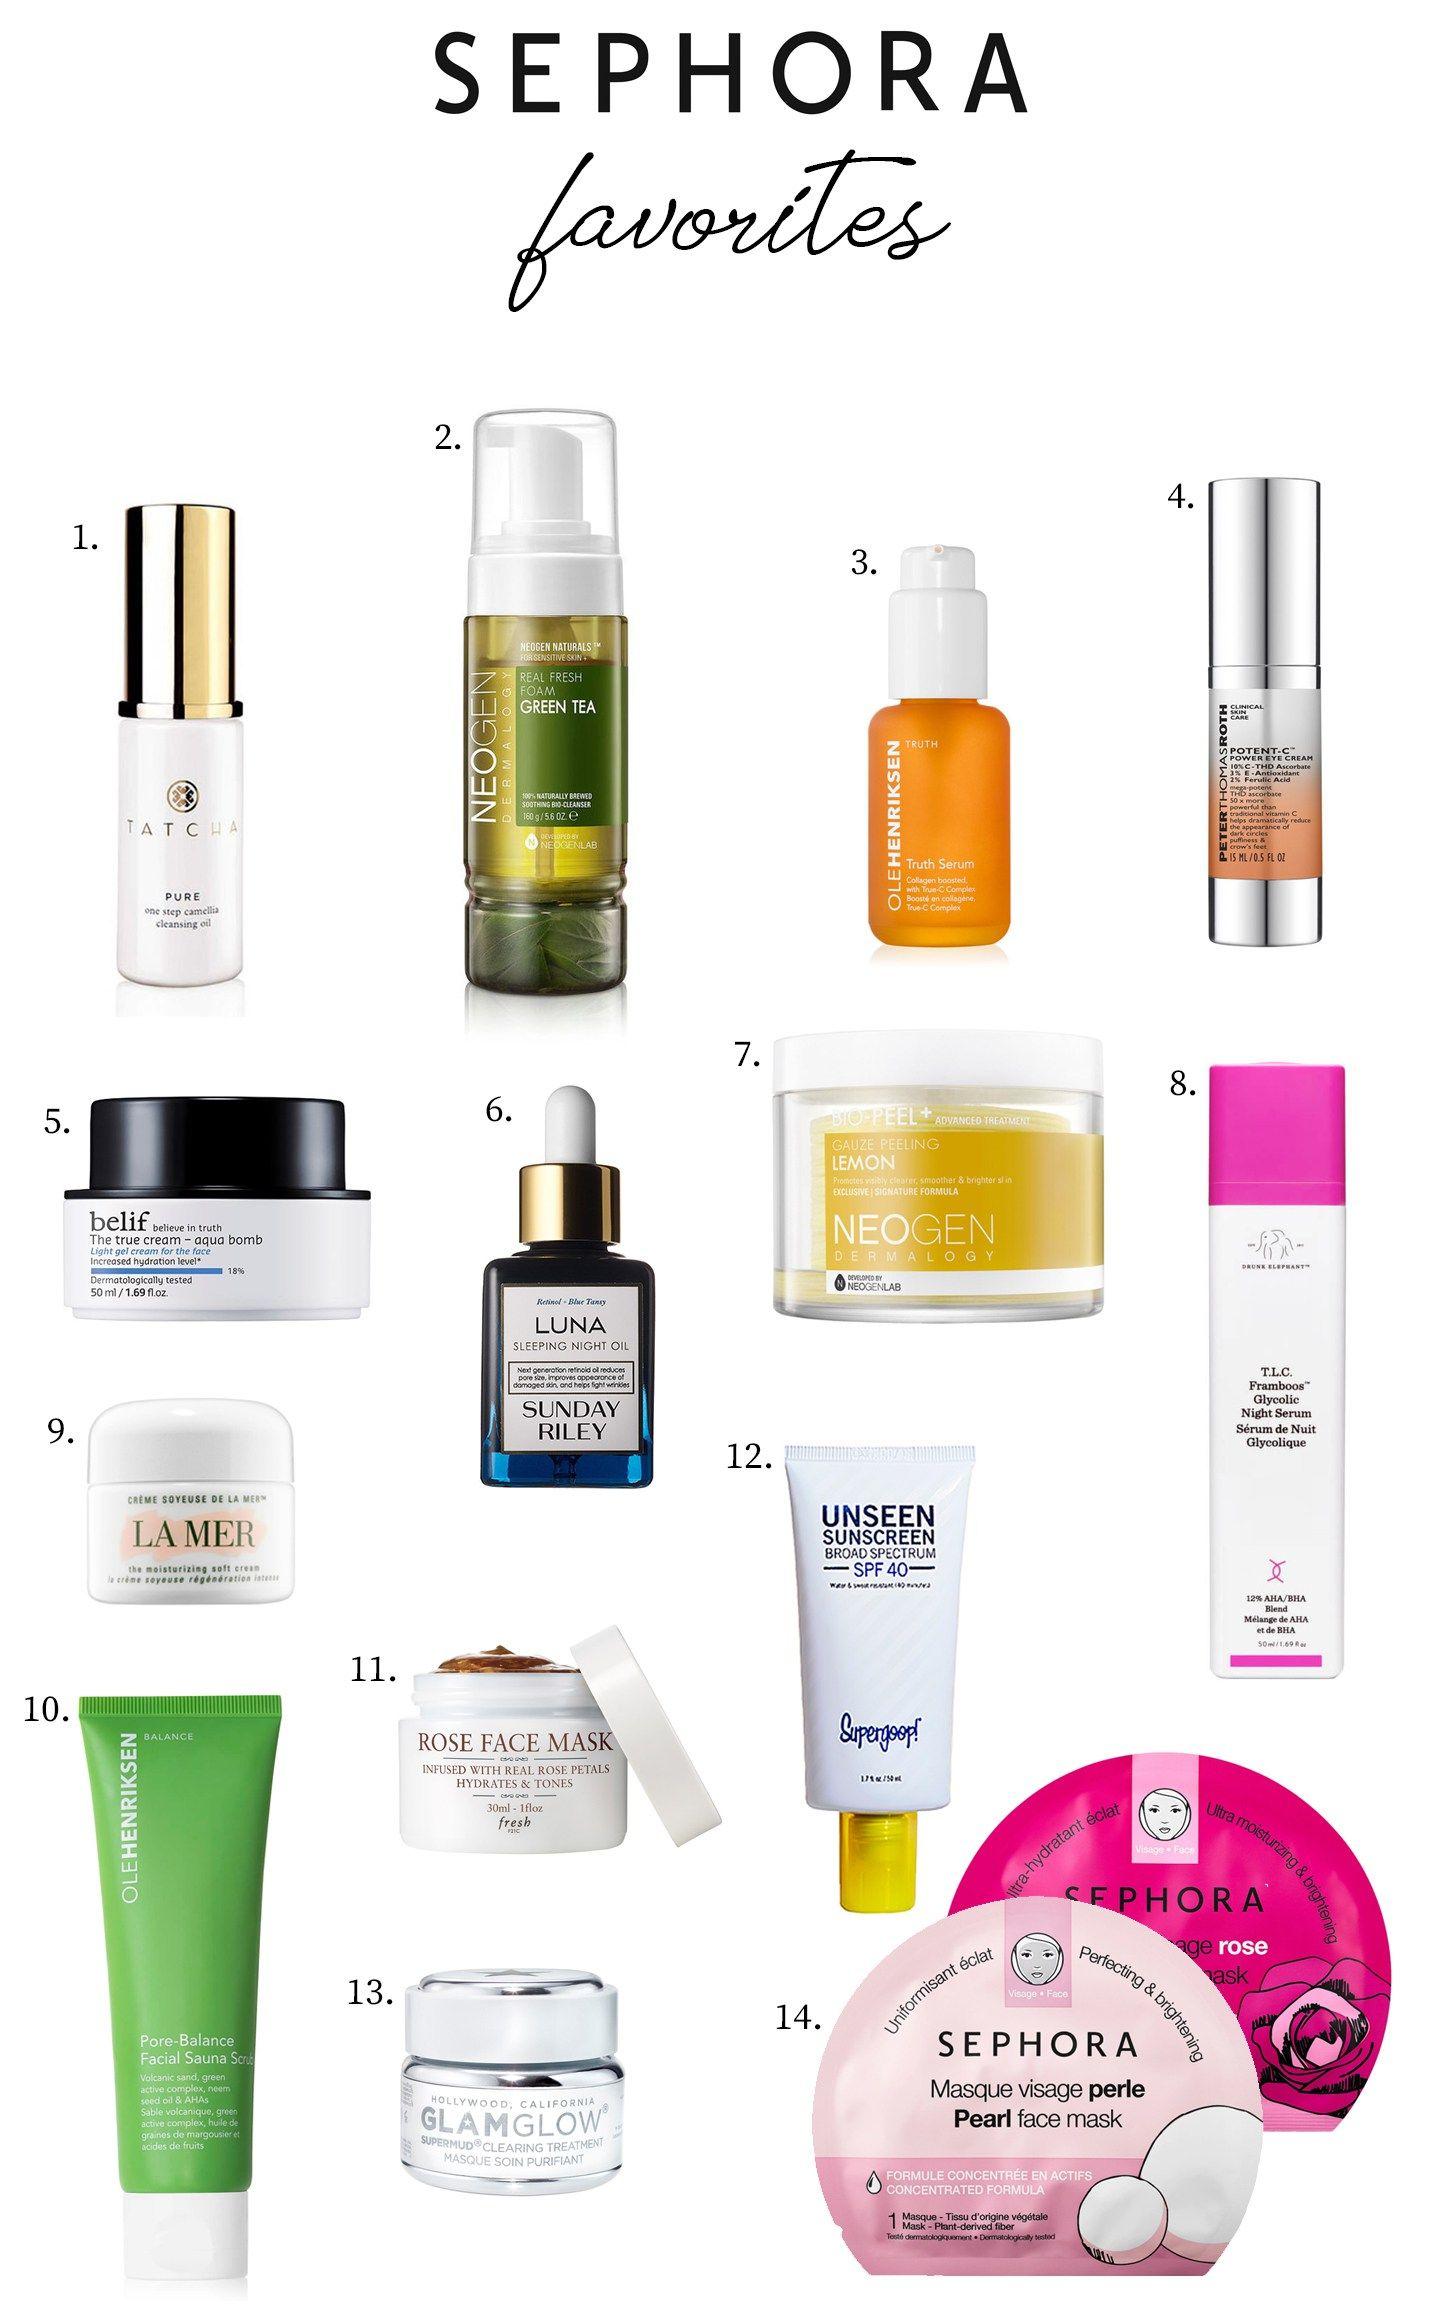 My Sephora Skincare Favorites Sephora Beauty Skincare Musthaves Sephoramusthaves Beautyproducts Top10 Sephora Skin Care Sephora Best Sephora Products